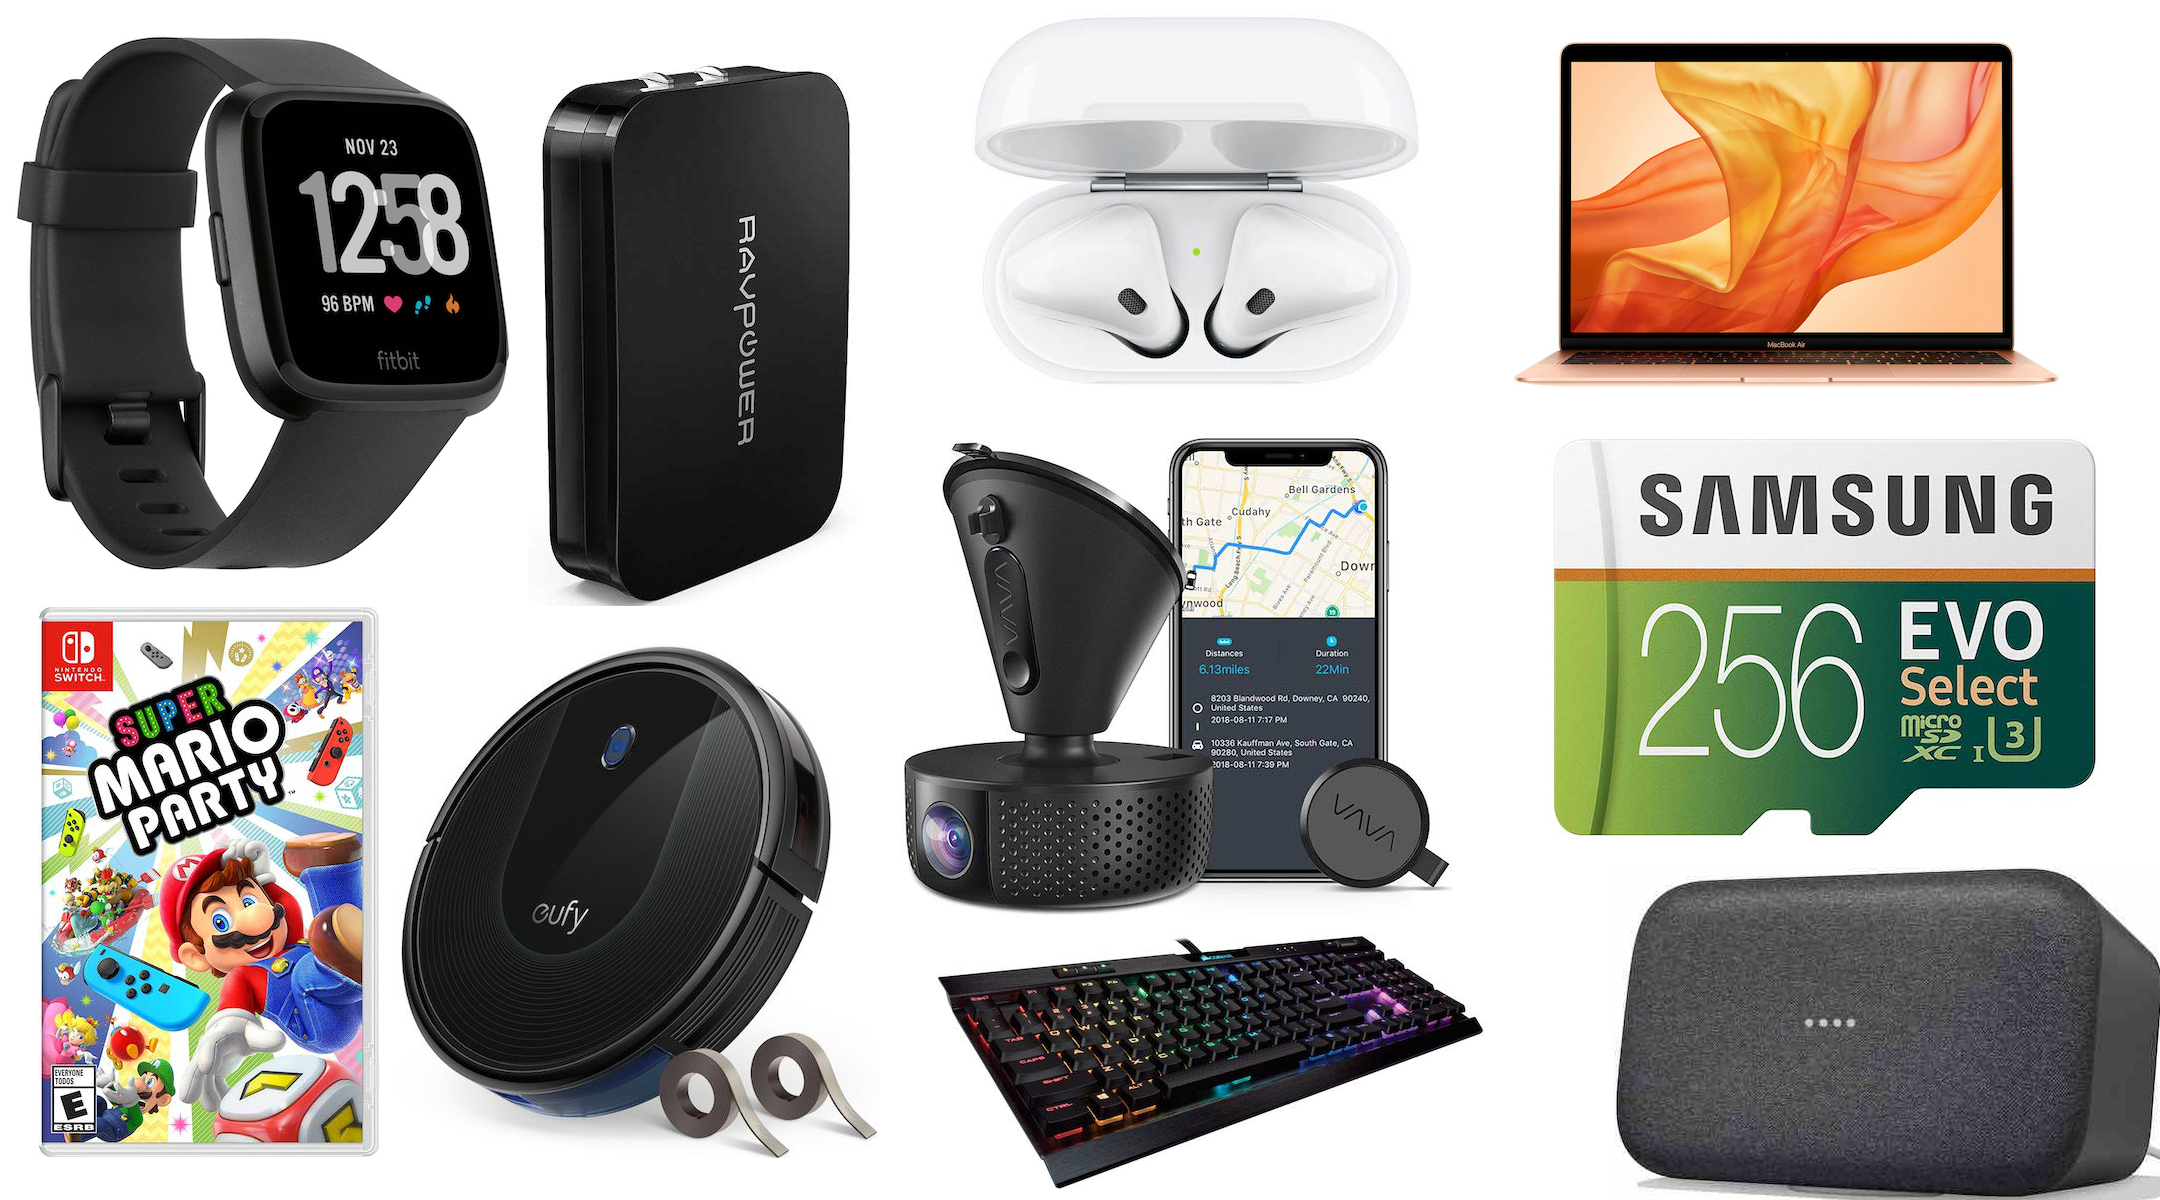 Dealmaster: Dash cam, iPad, robot vacuums, and more tech